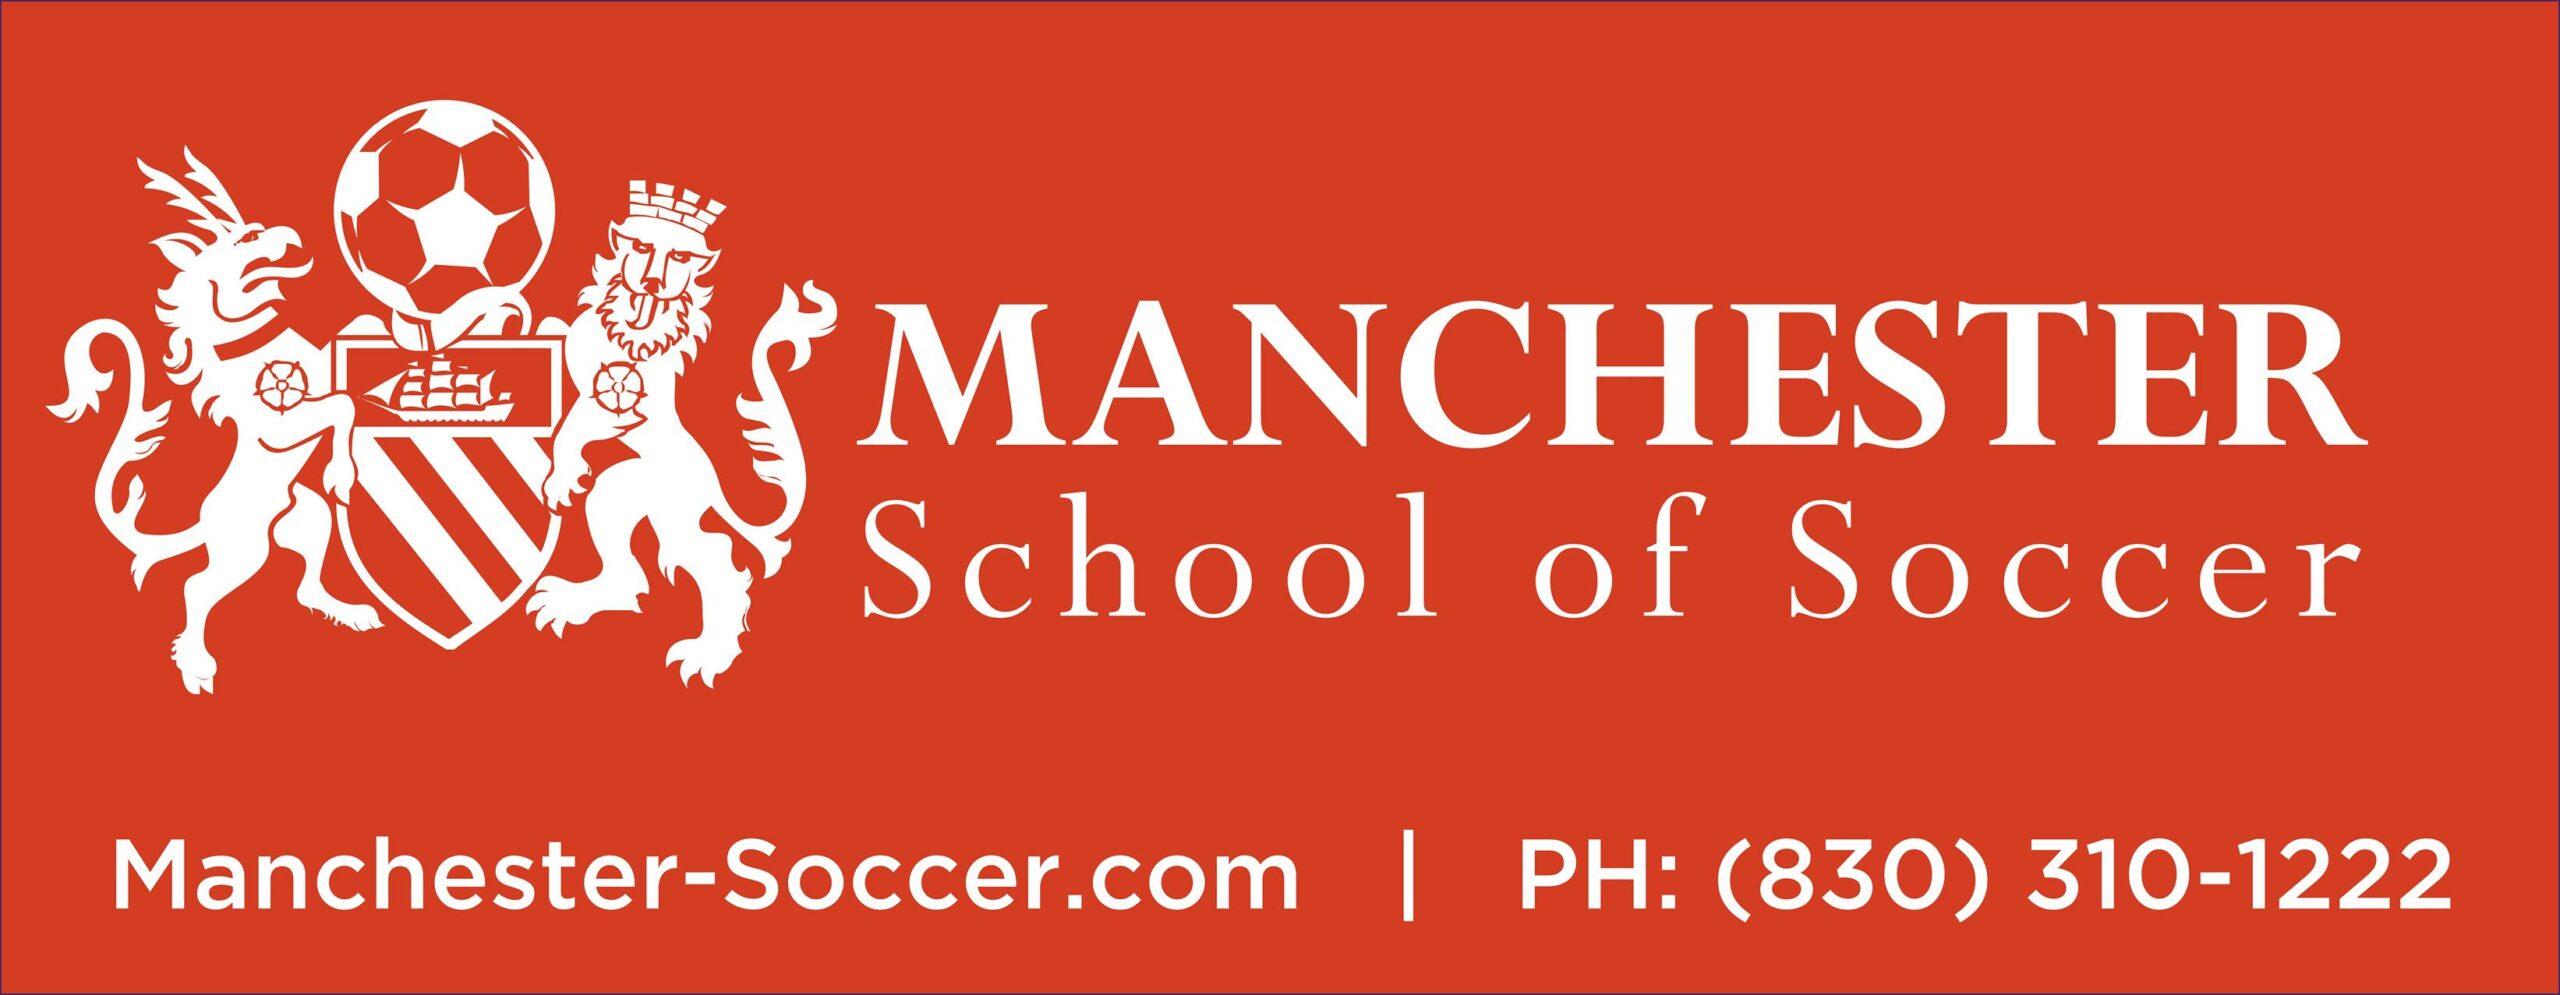 Manchester School of Soccer Logo